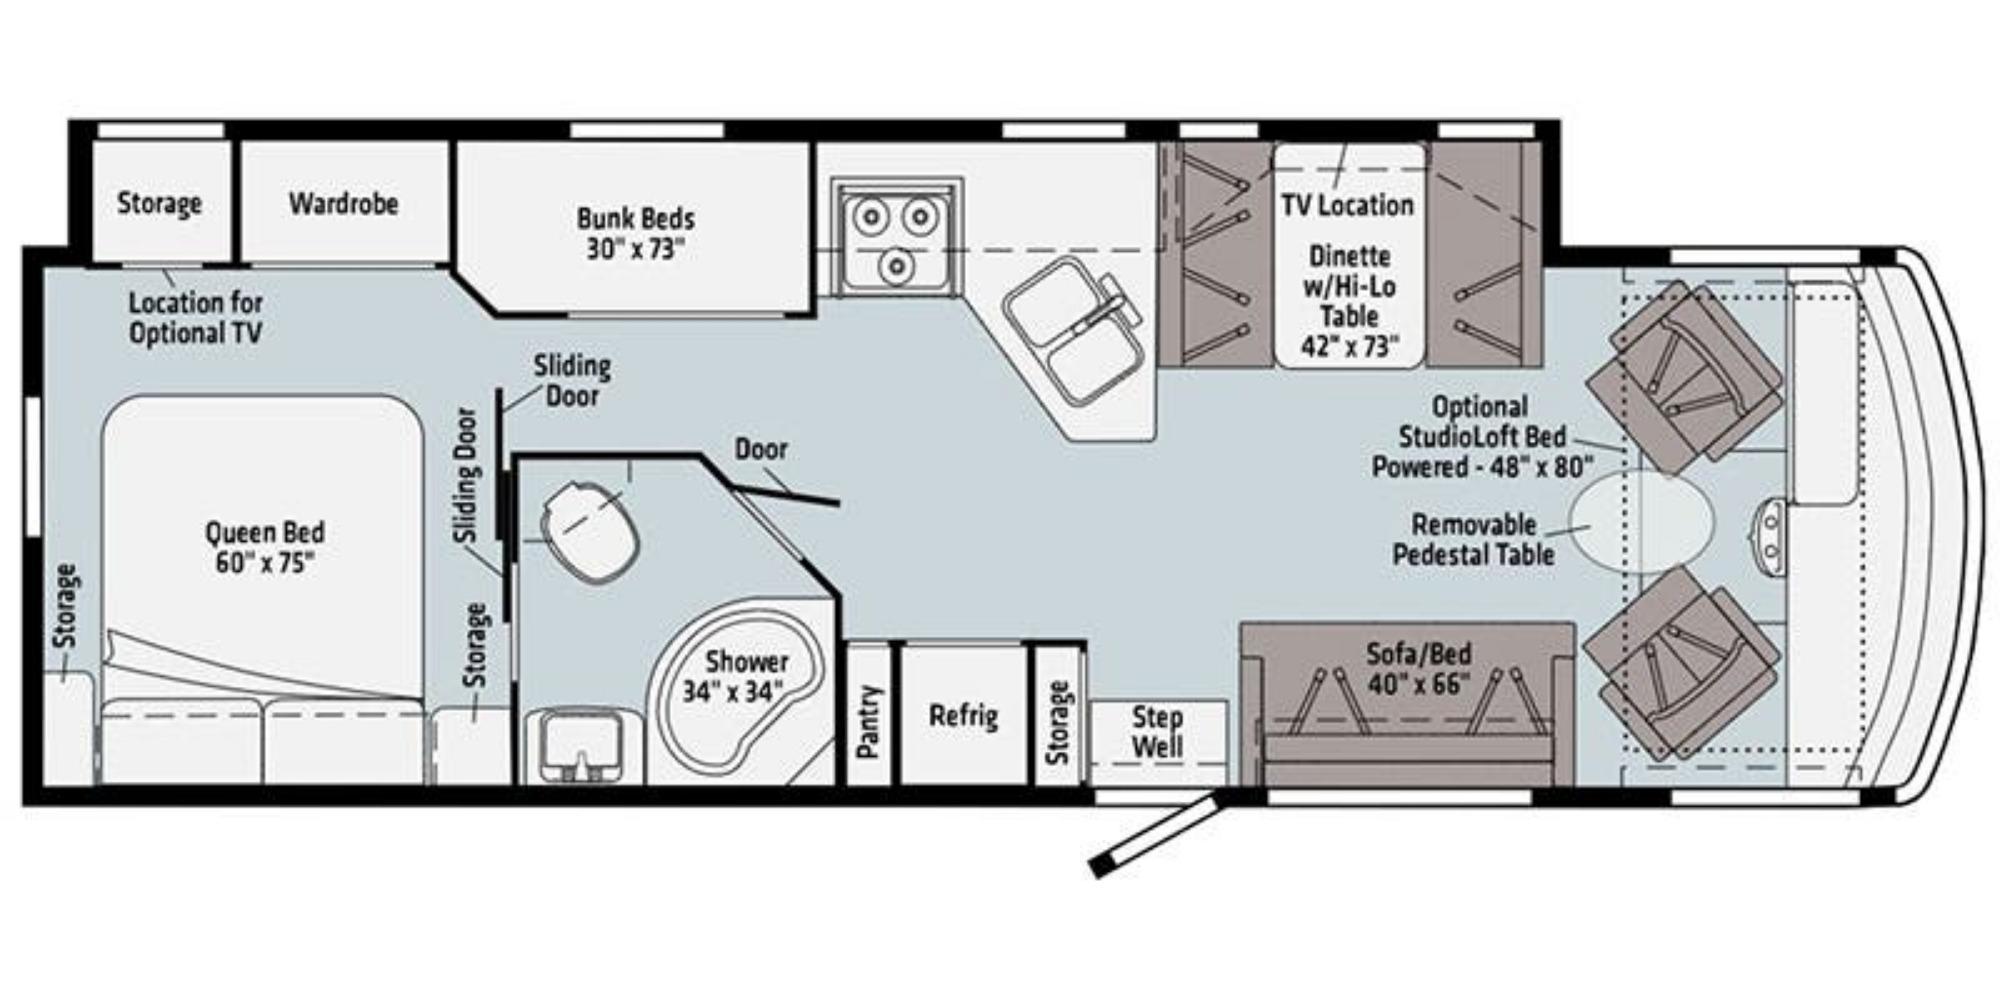 View Floor Plan for 2021 WINNEBAGO VISTA 31B